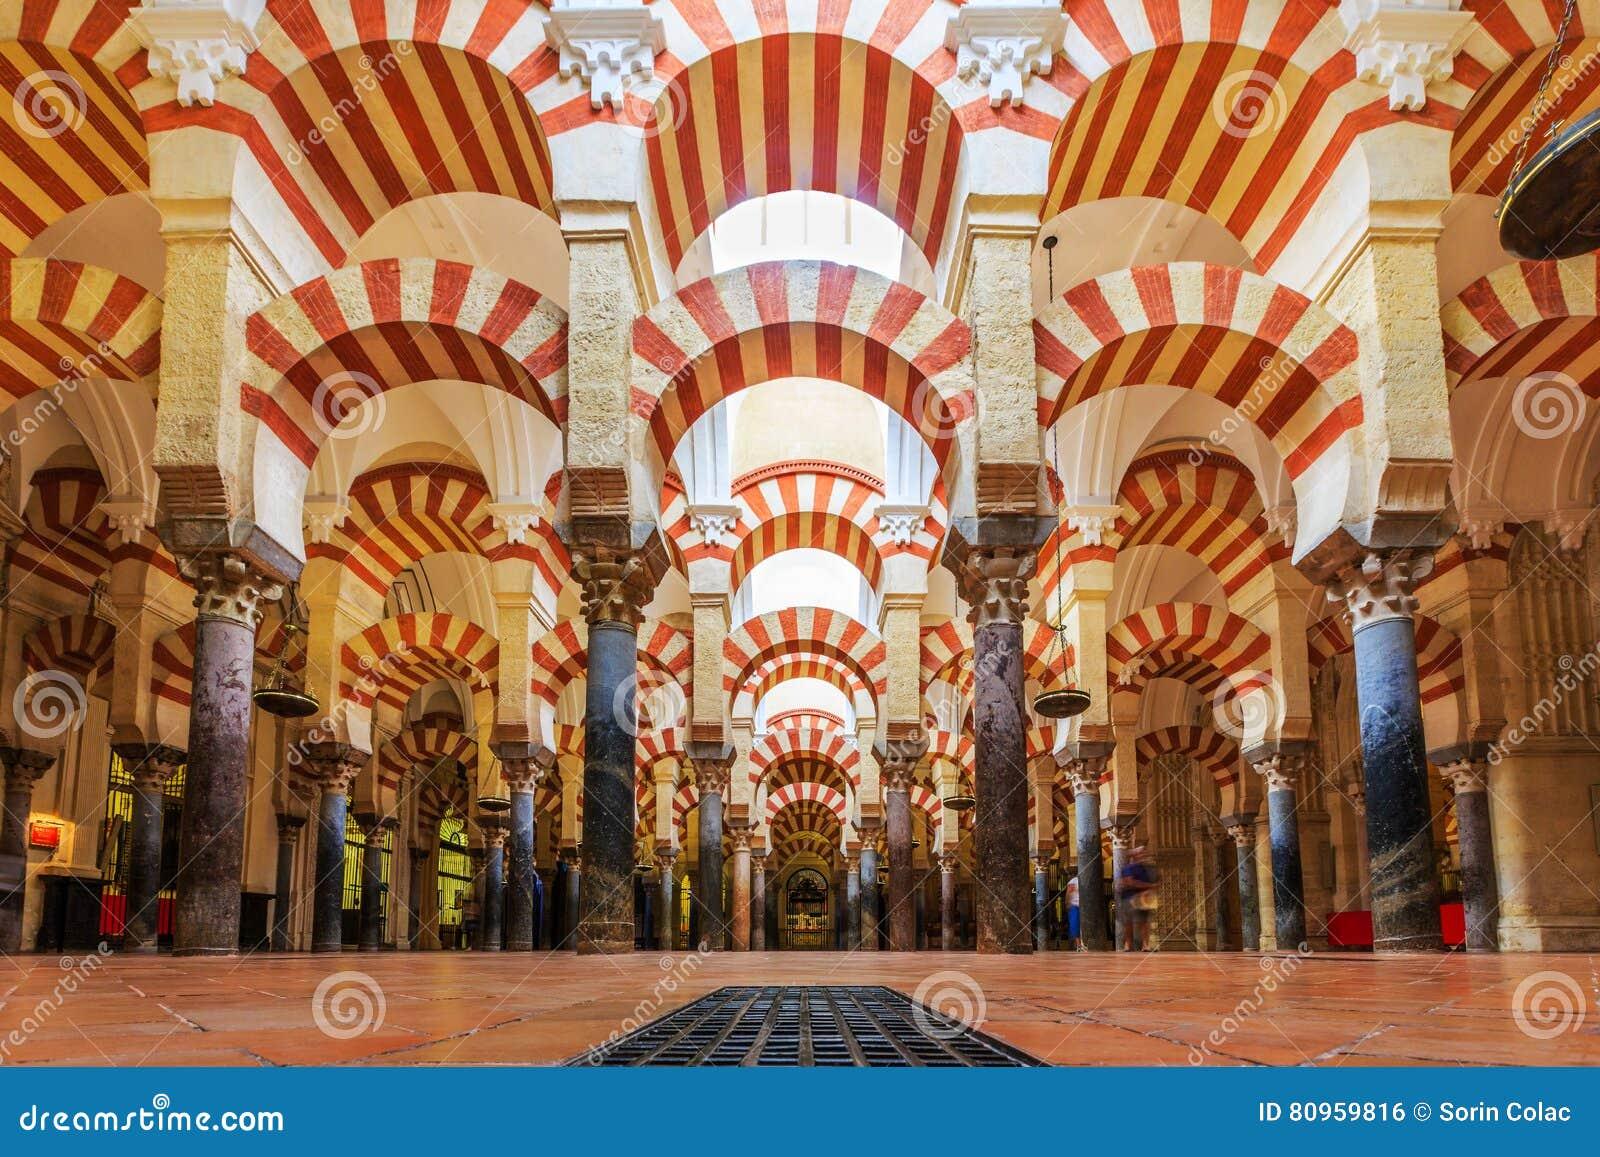 la mezquita cathedral in cordoba spain editorial photo image of